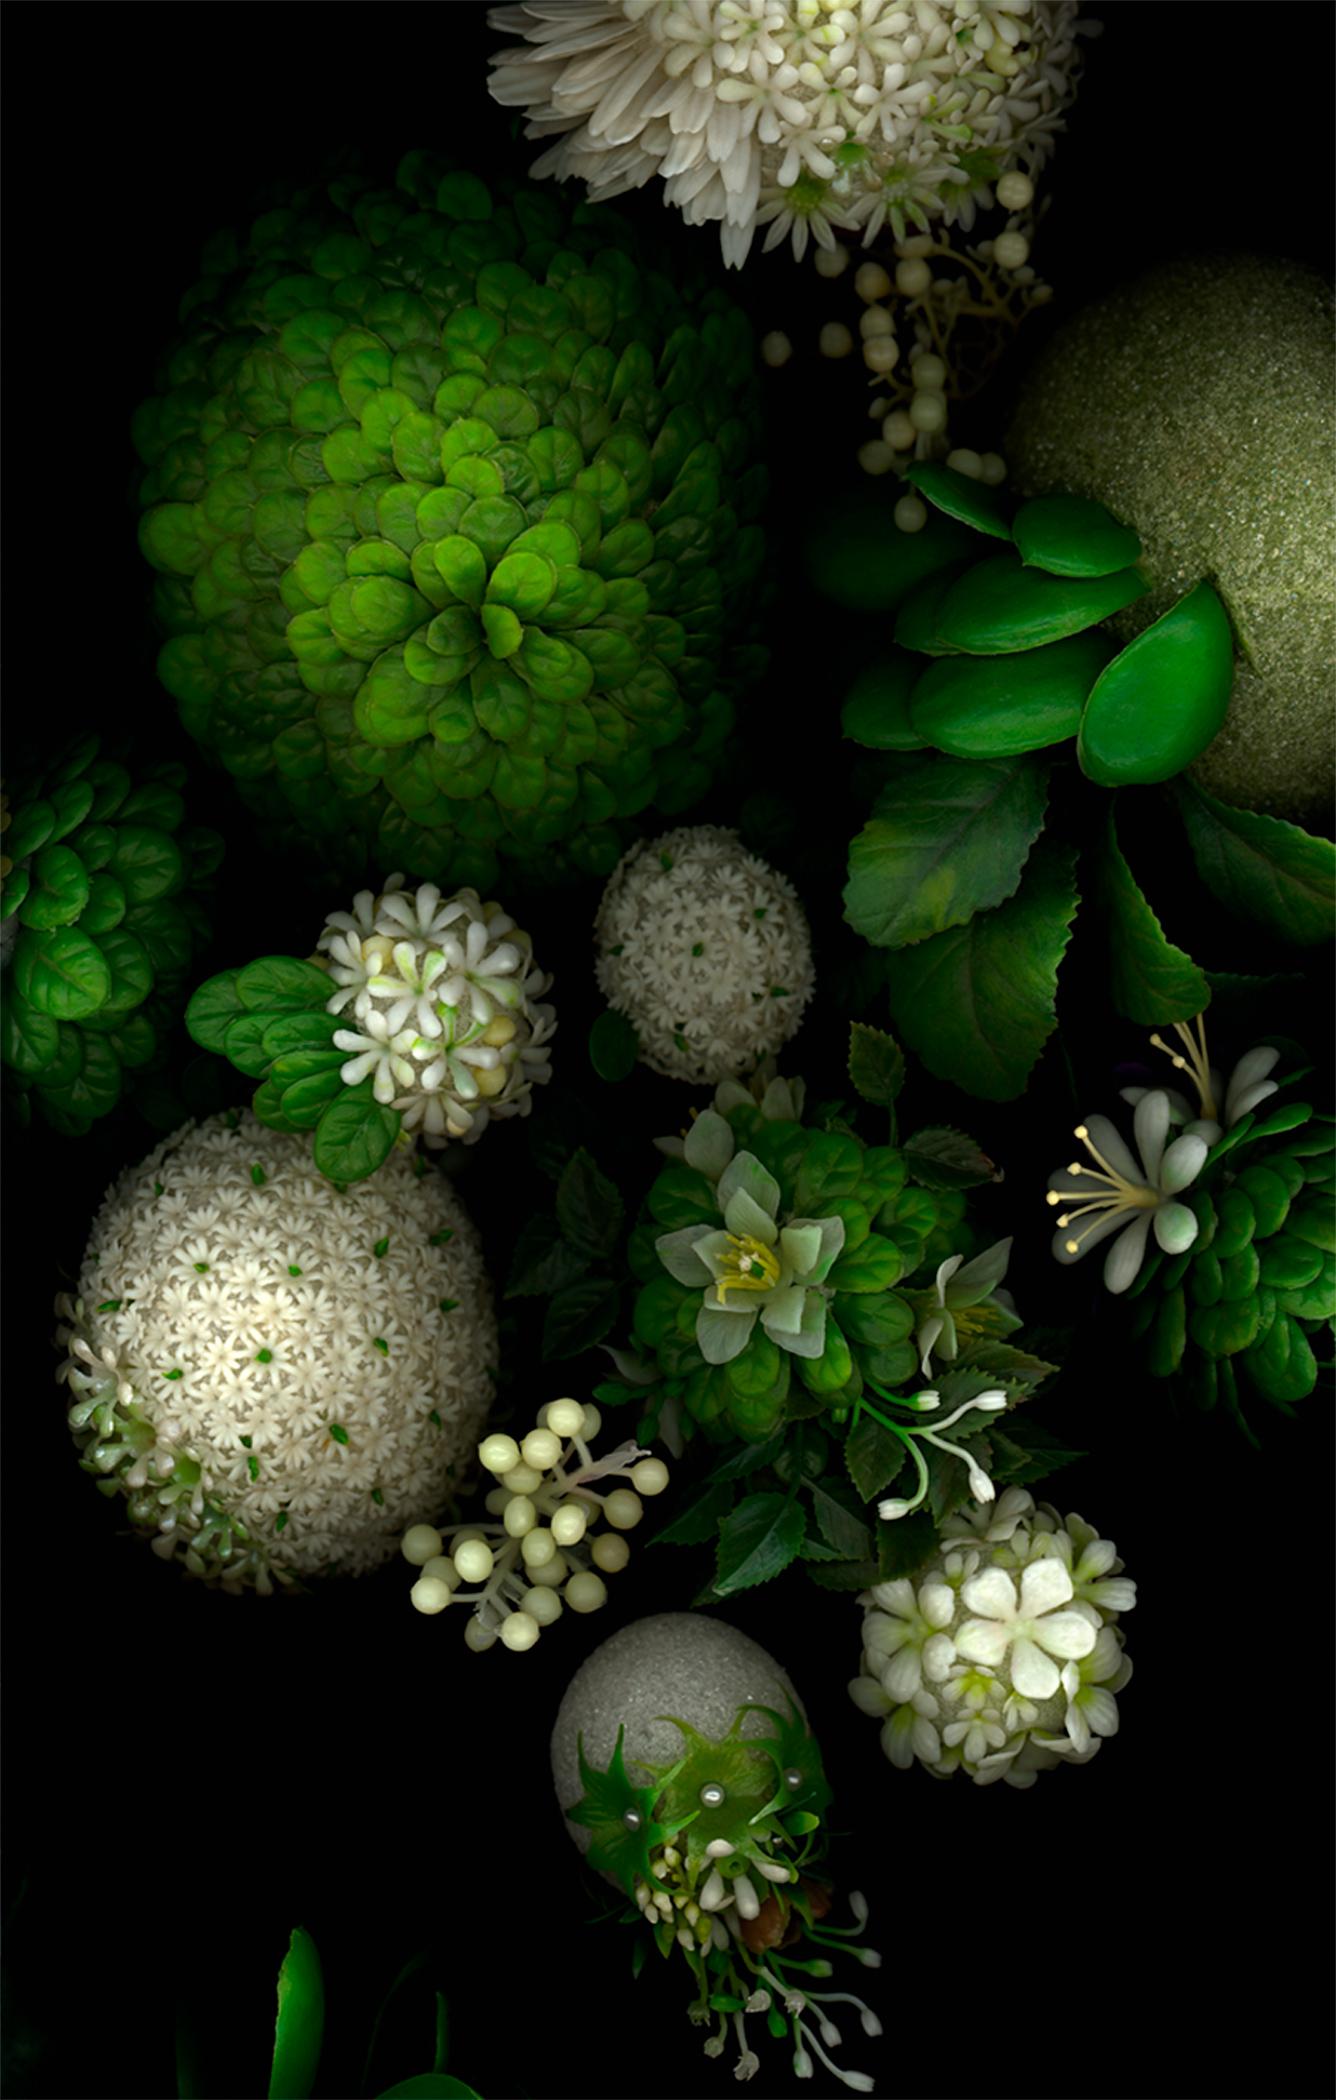 "greens, bioposy #2,digital c print, 2007, 42"" x 67"""